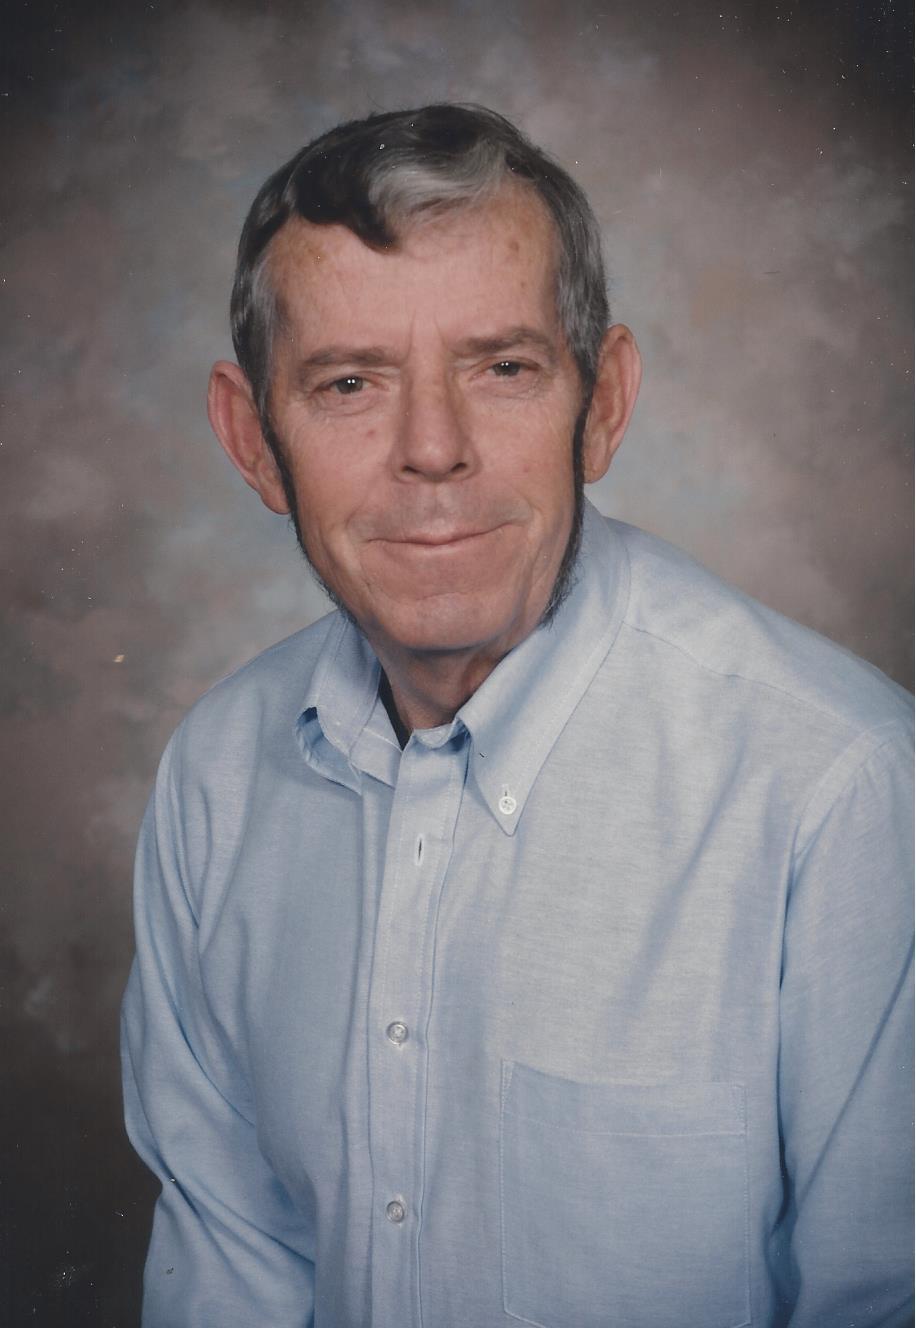 Kenneth Merriman